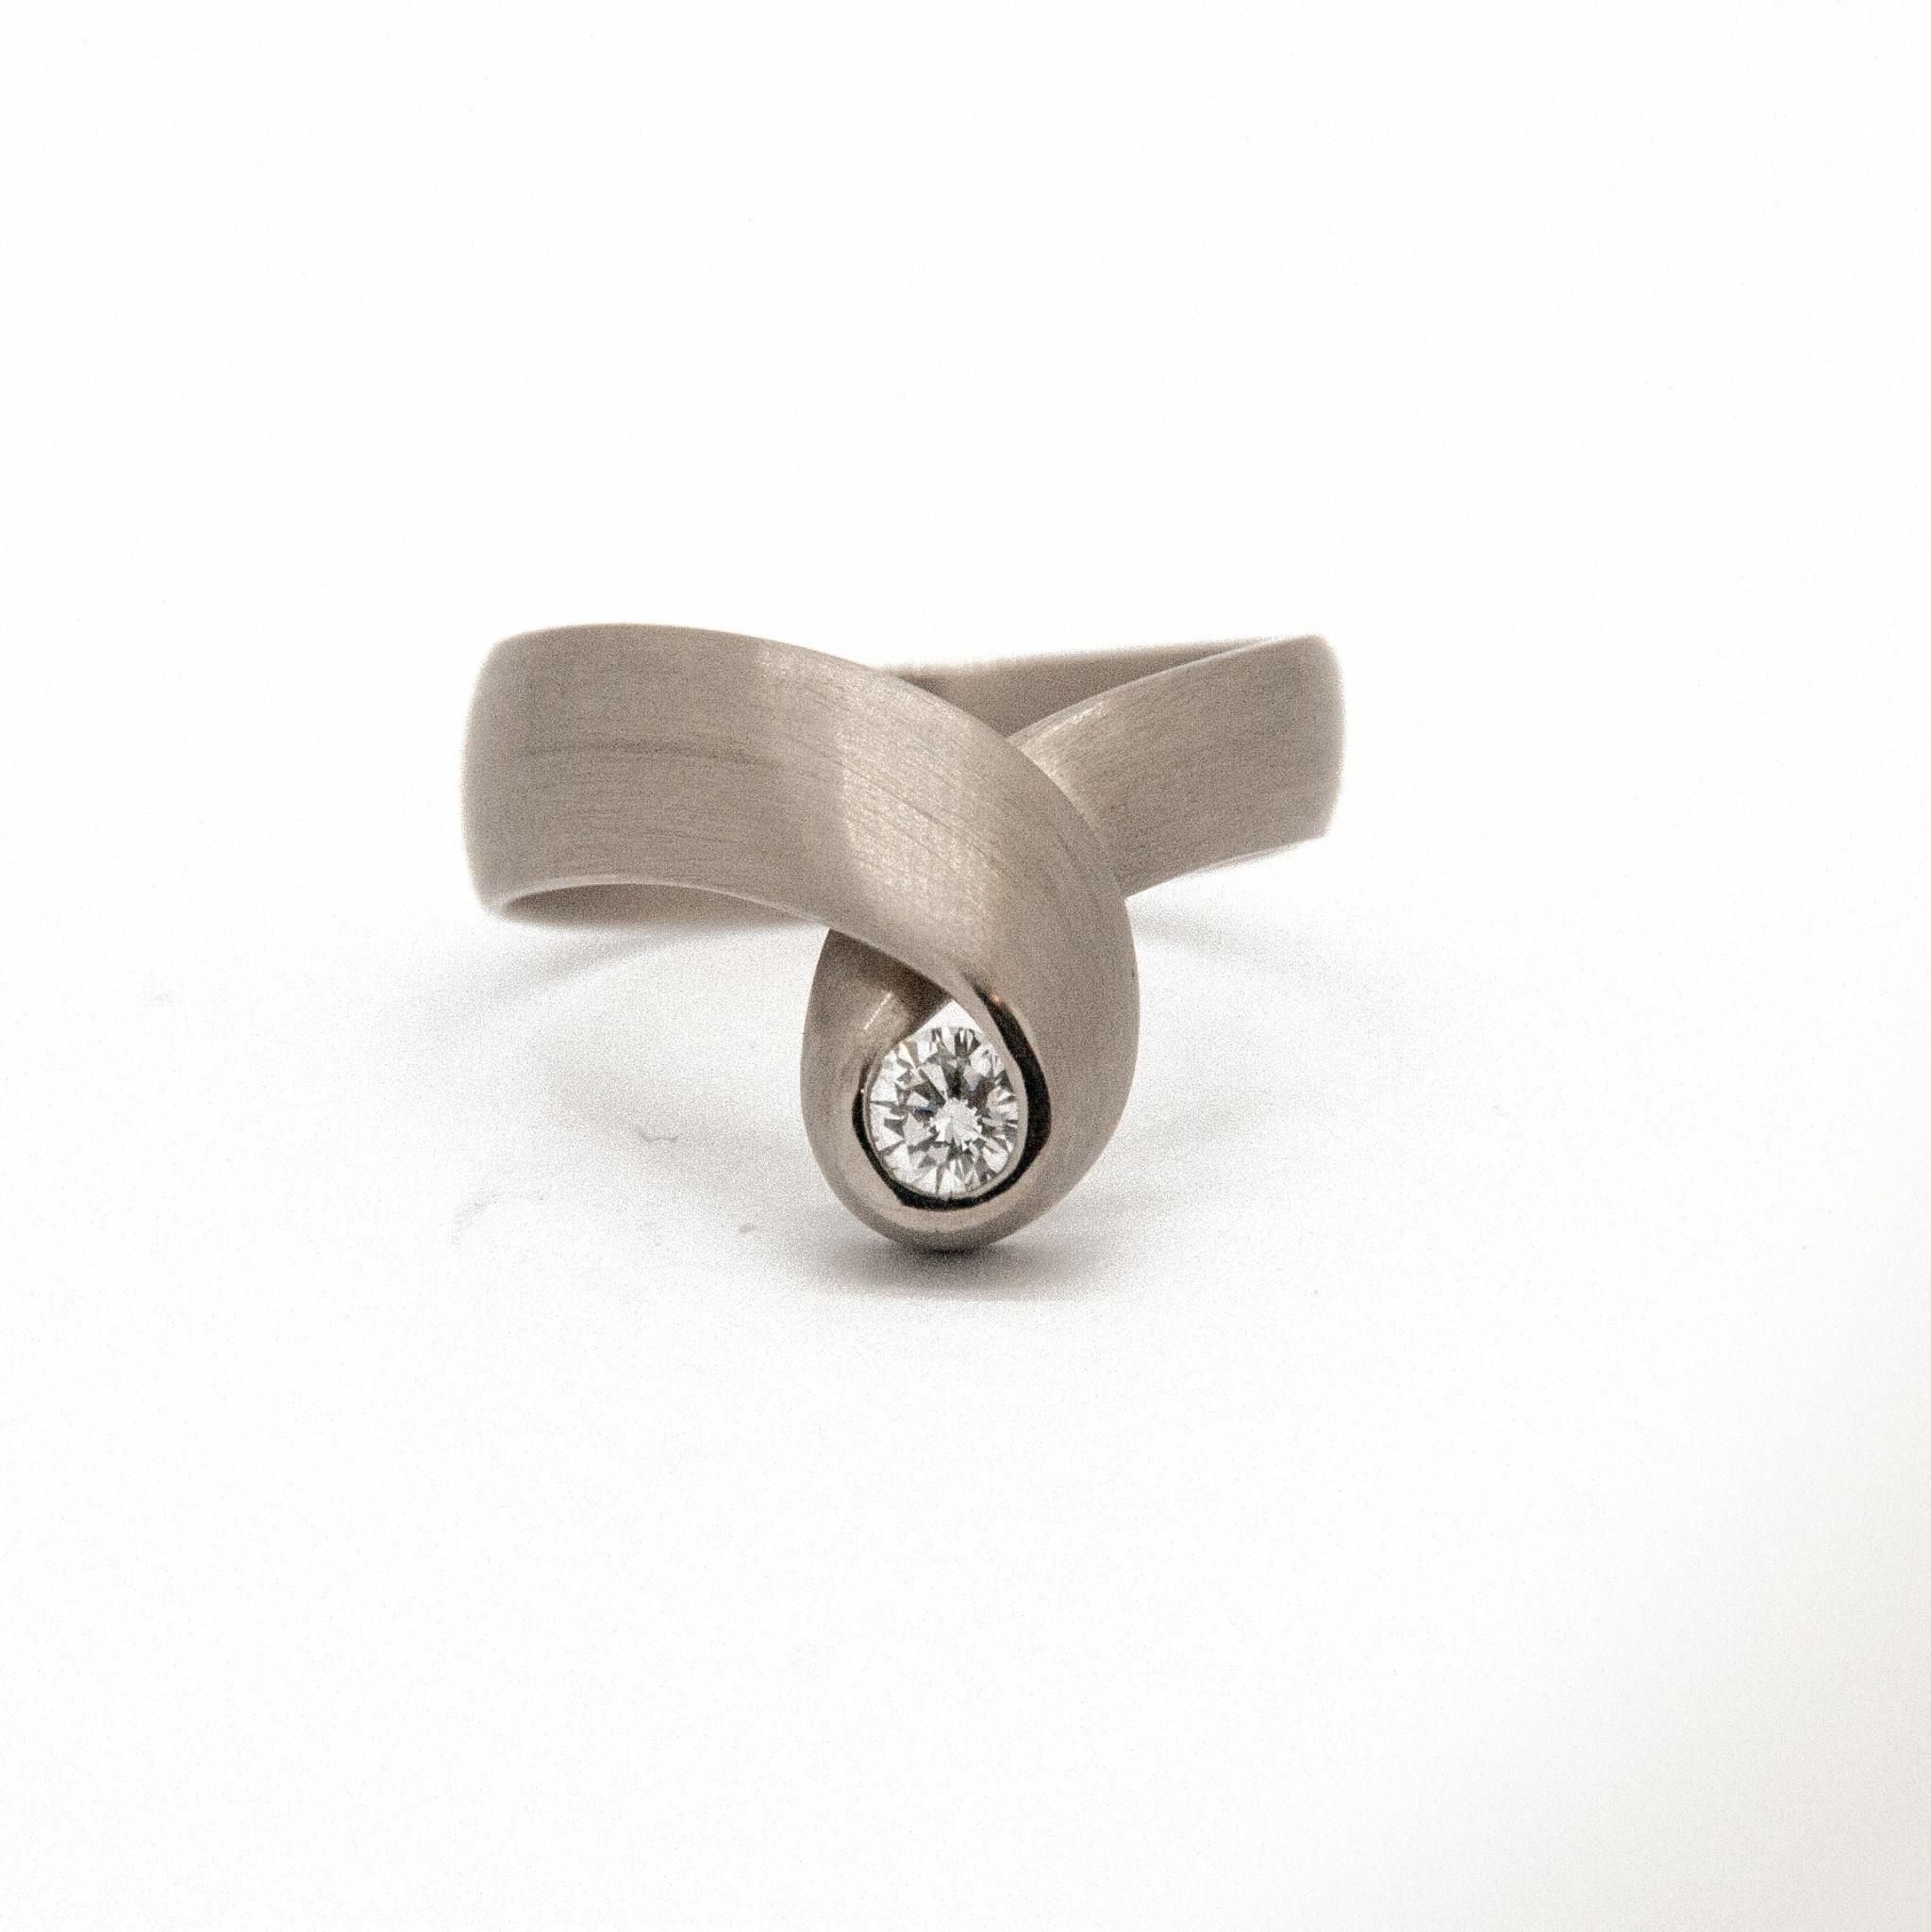 14k white gold ring size 56-11